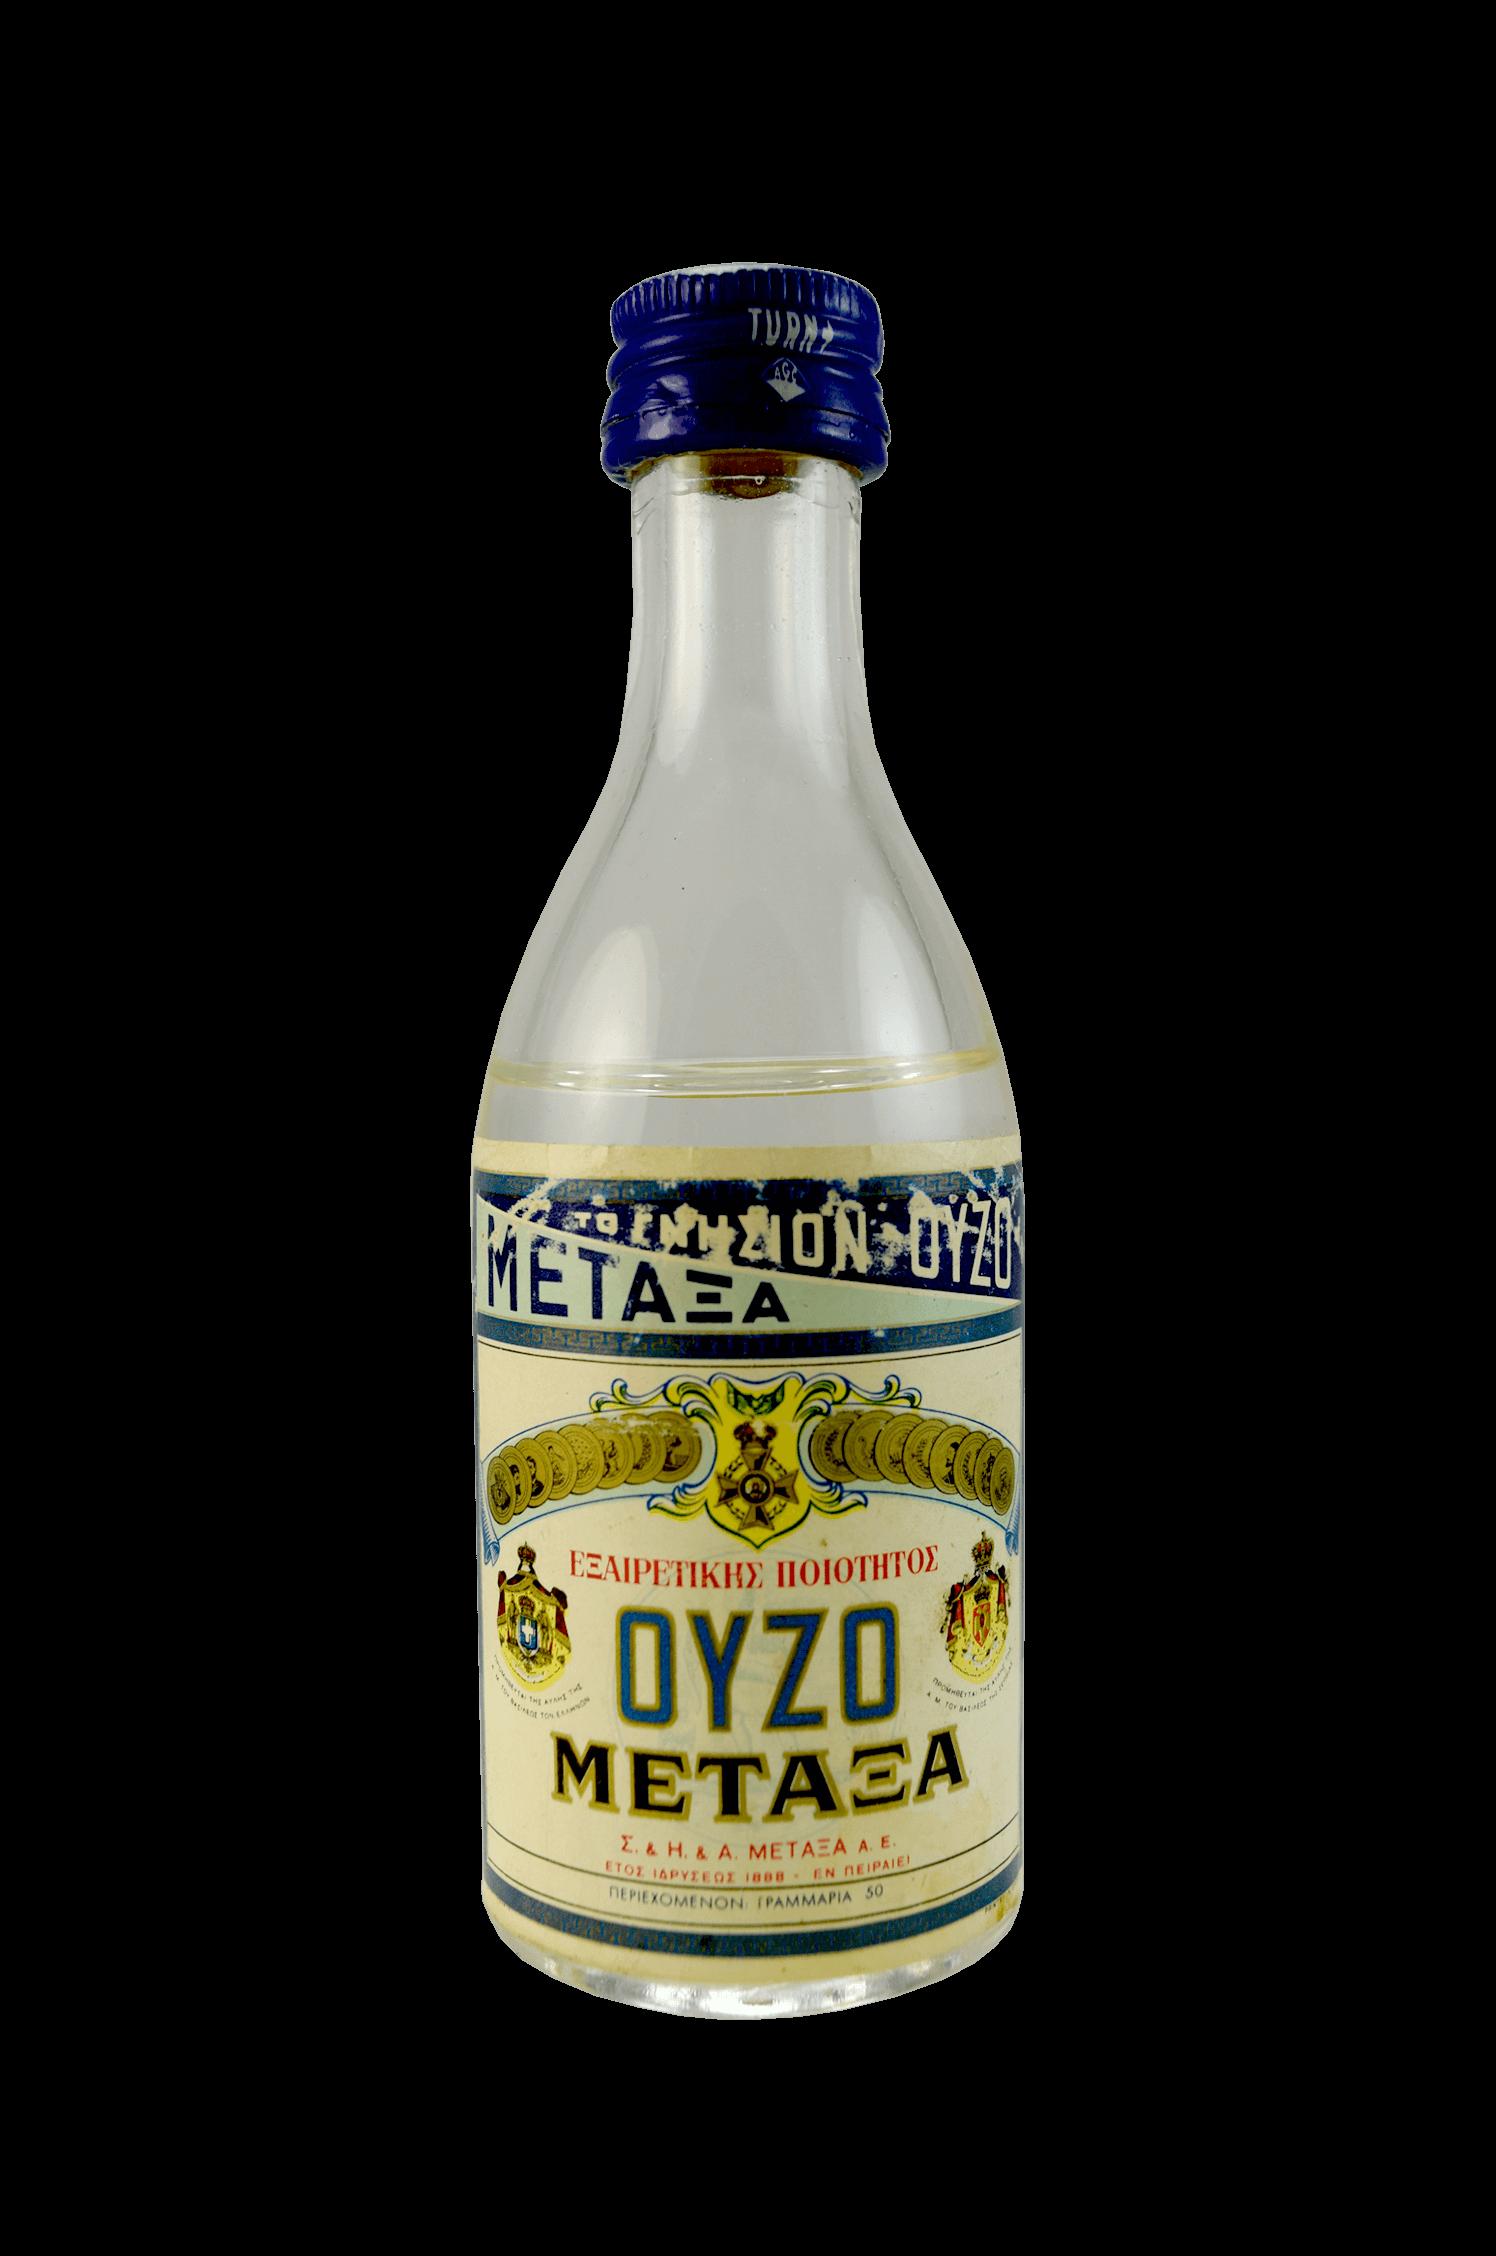 Oyzo Metaxa